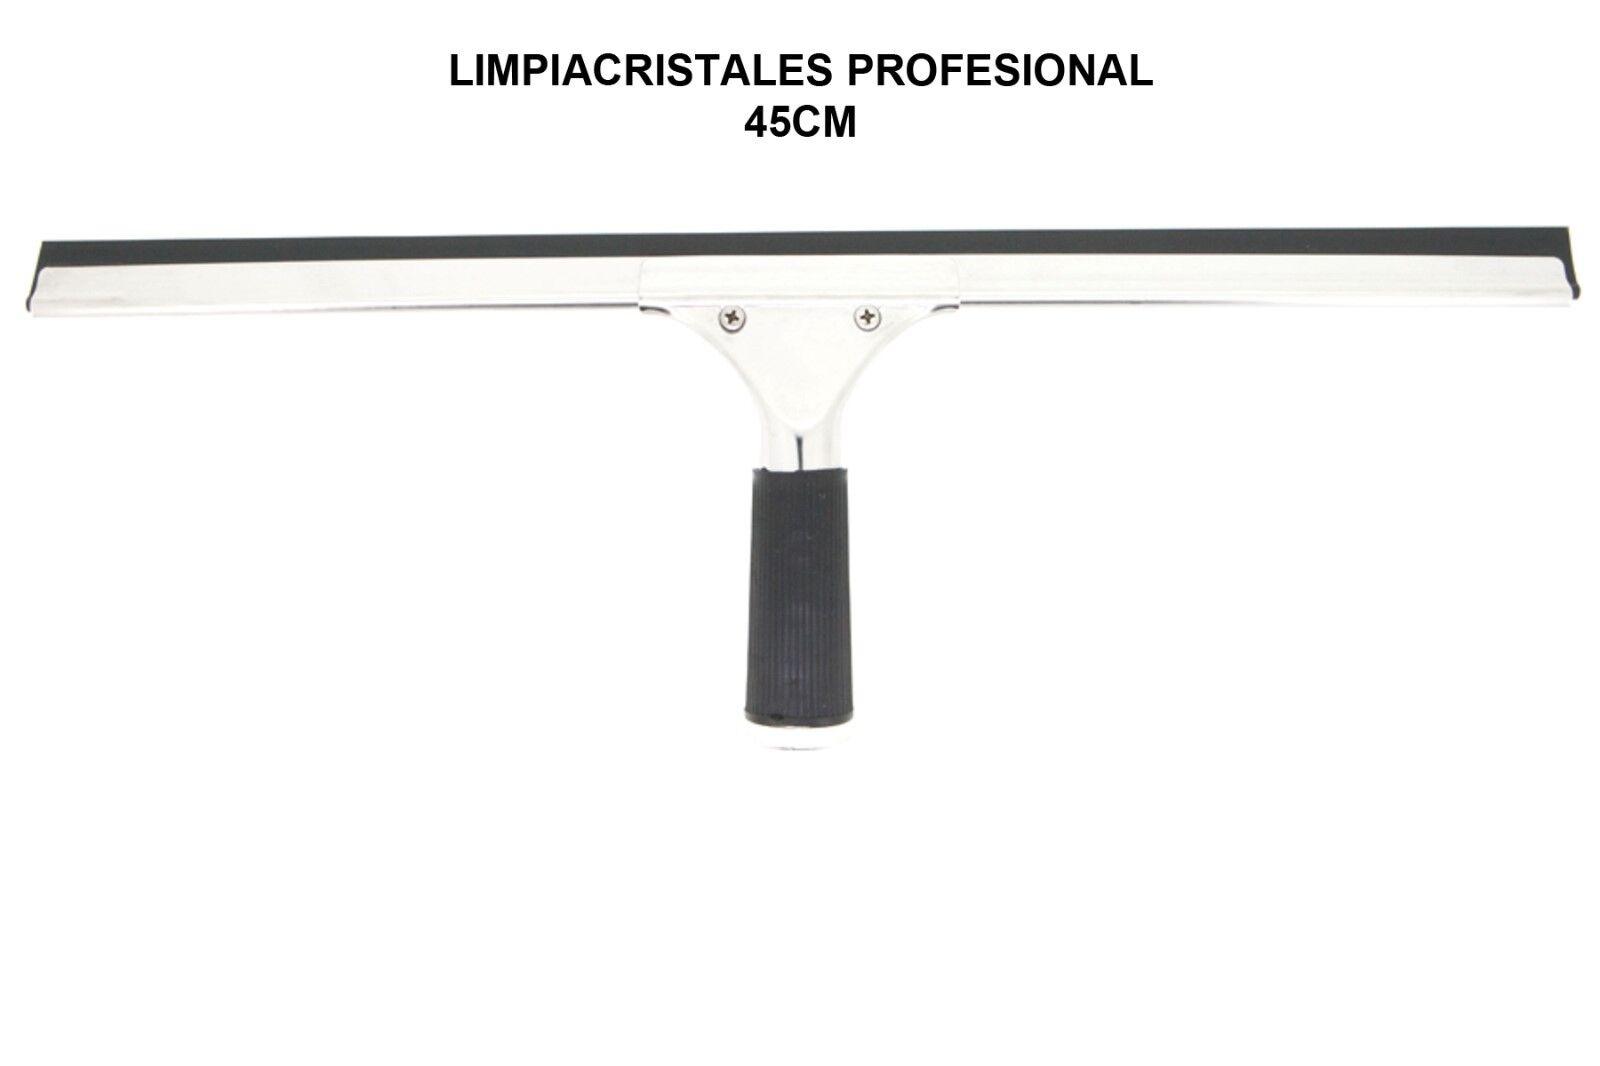 Regleta raqueta limpia vidrios - lunas - cristales profesional con soporte 45...